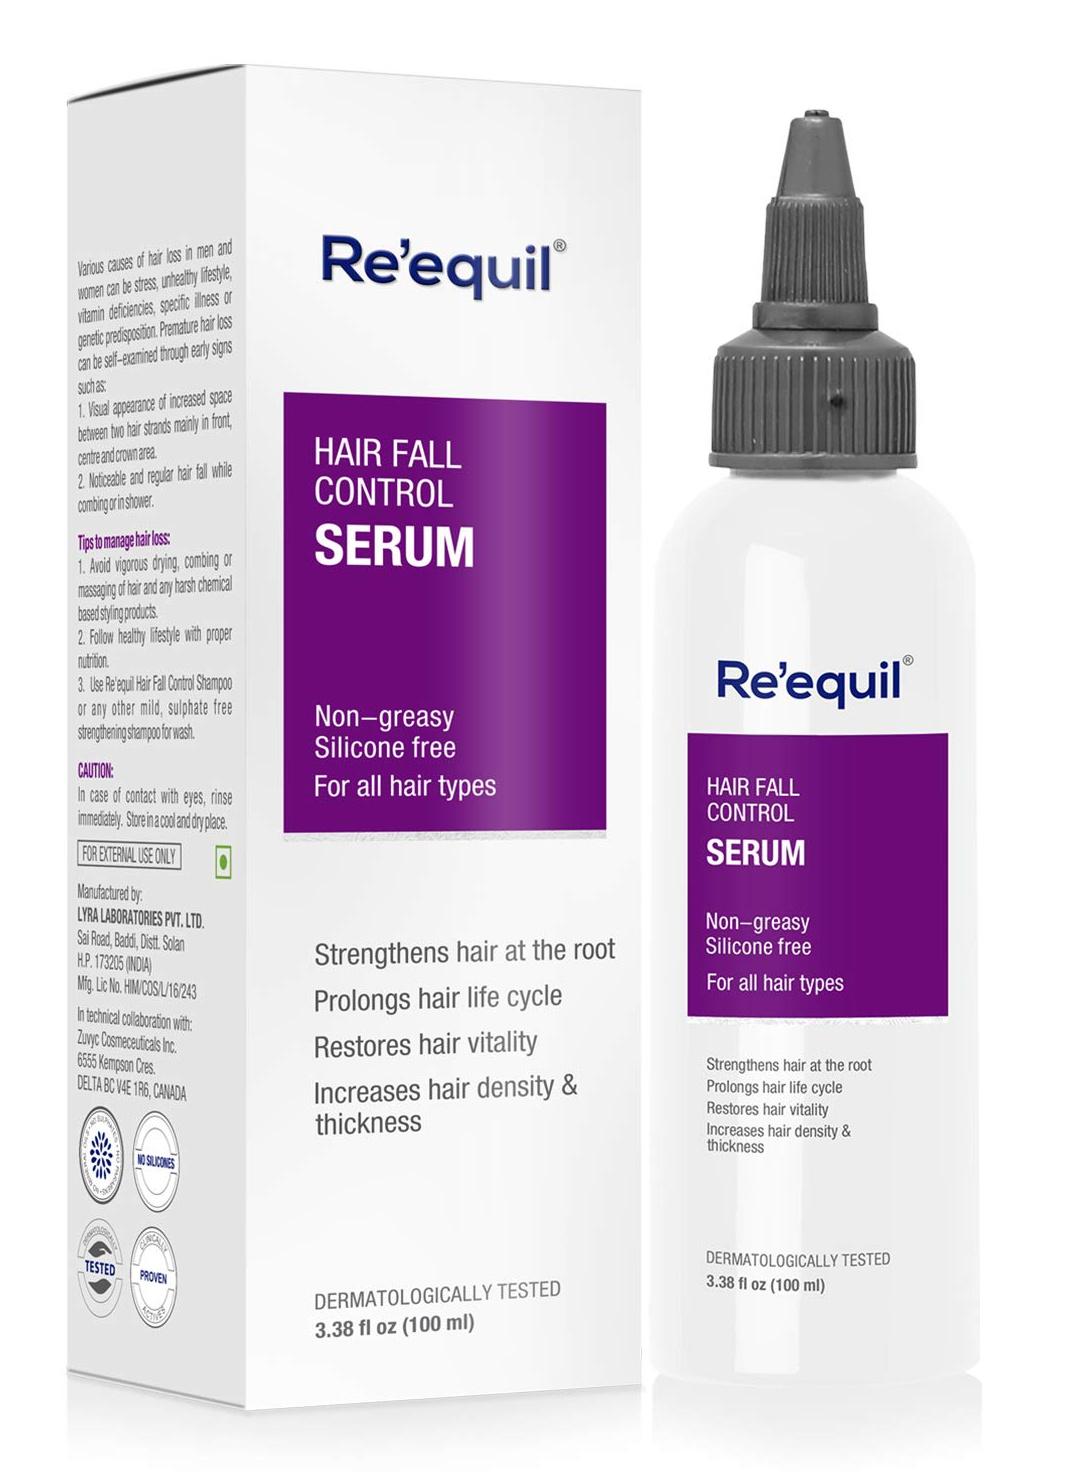 Re'equil Hair Fall Control Serum